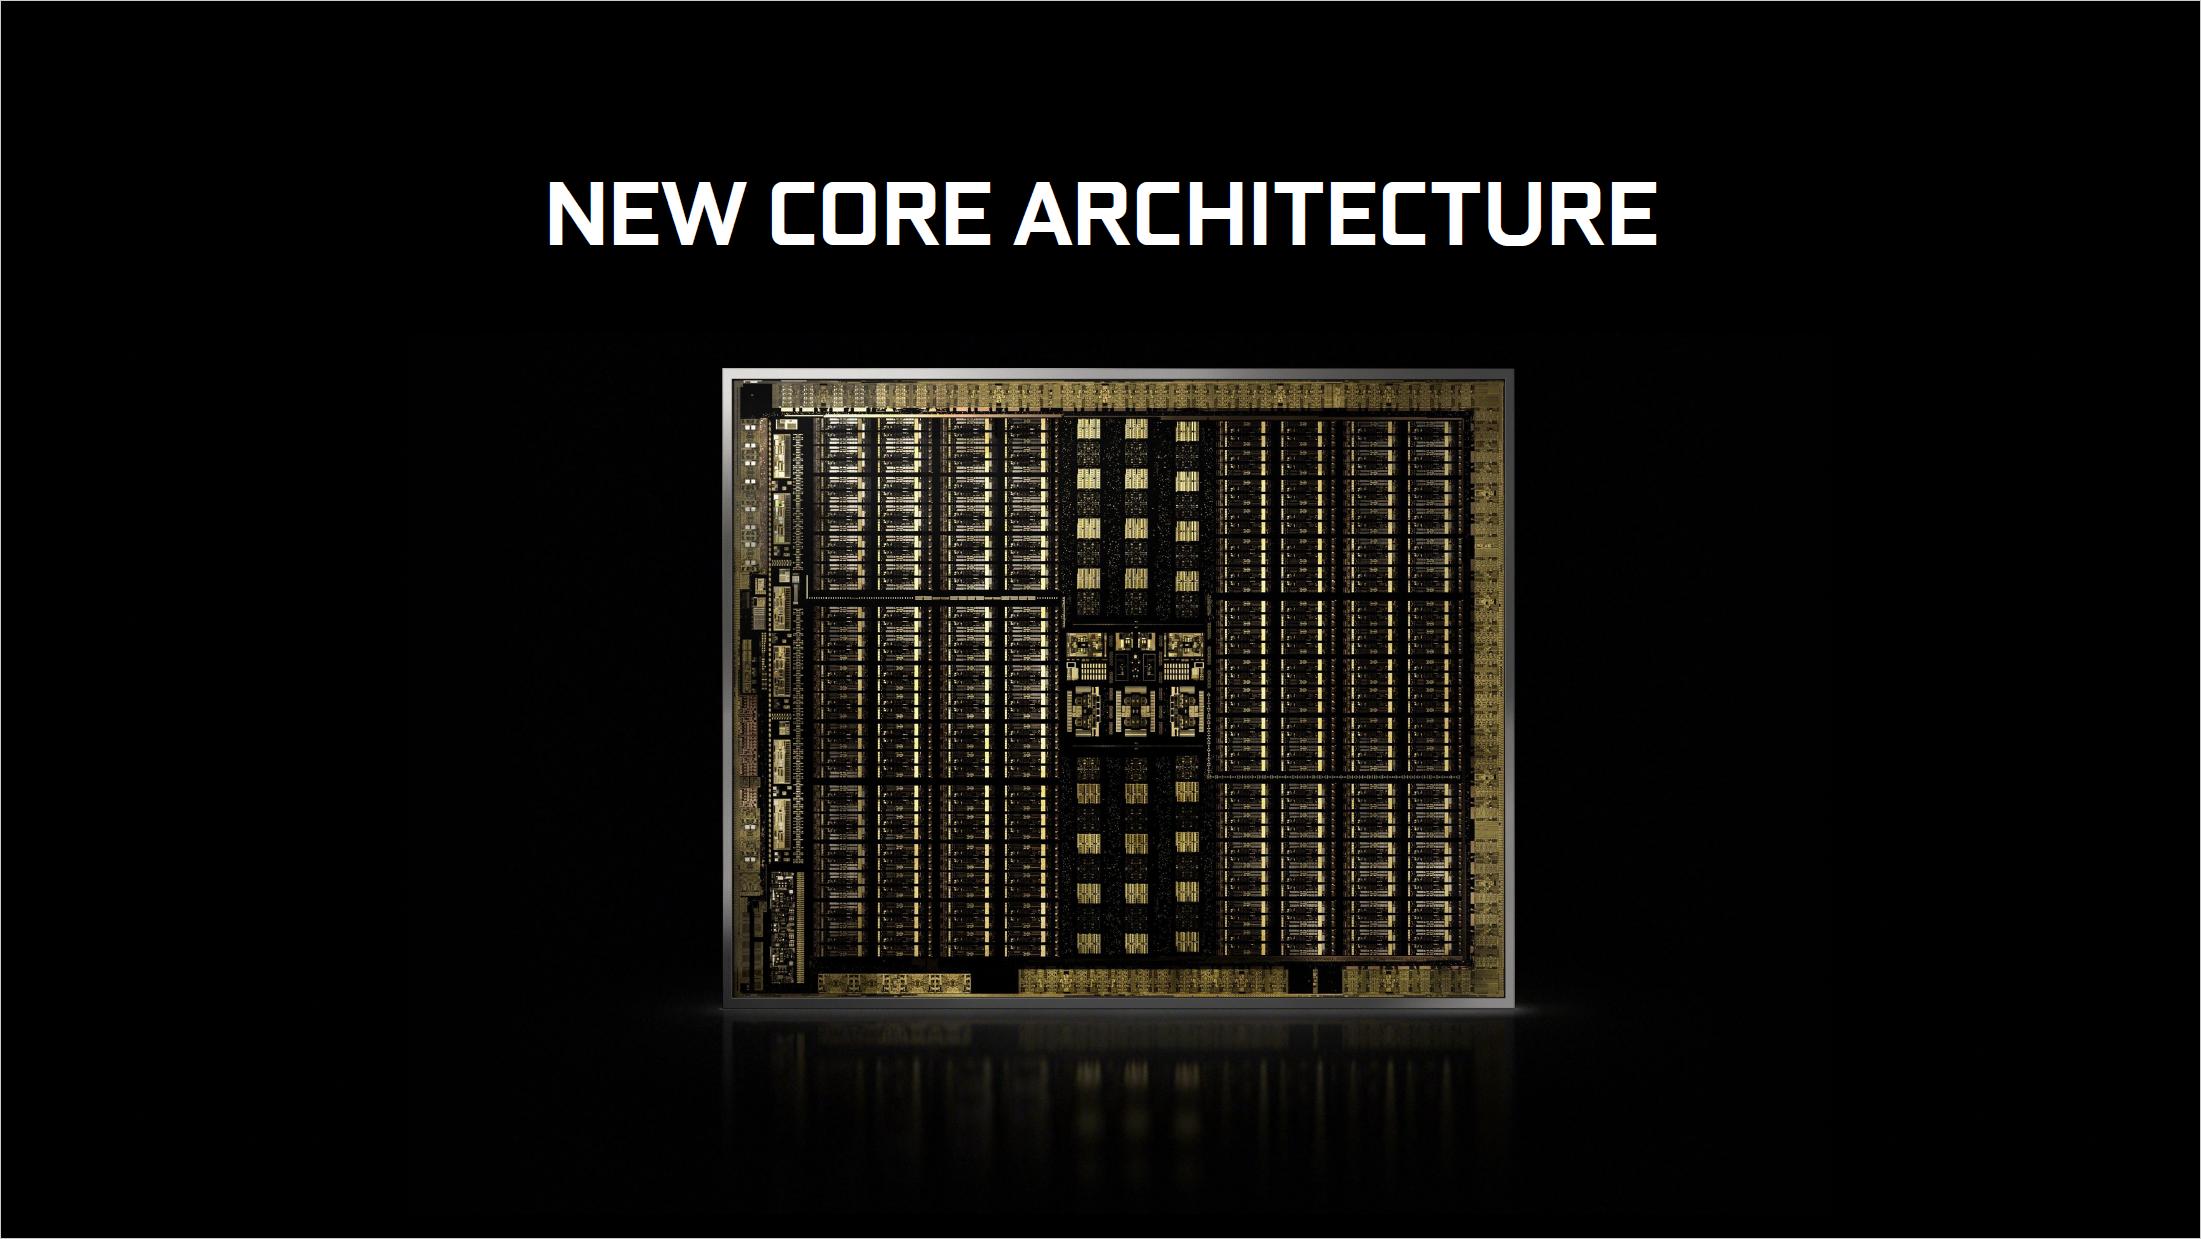 Grafikkarten: Das kann Nvidias Turing-Architektur - Turing folgt auf Pascal. (Bild: Nvidia)